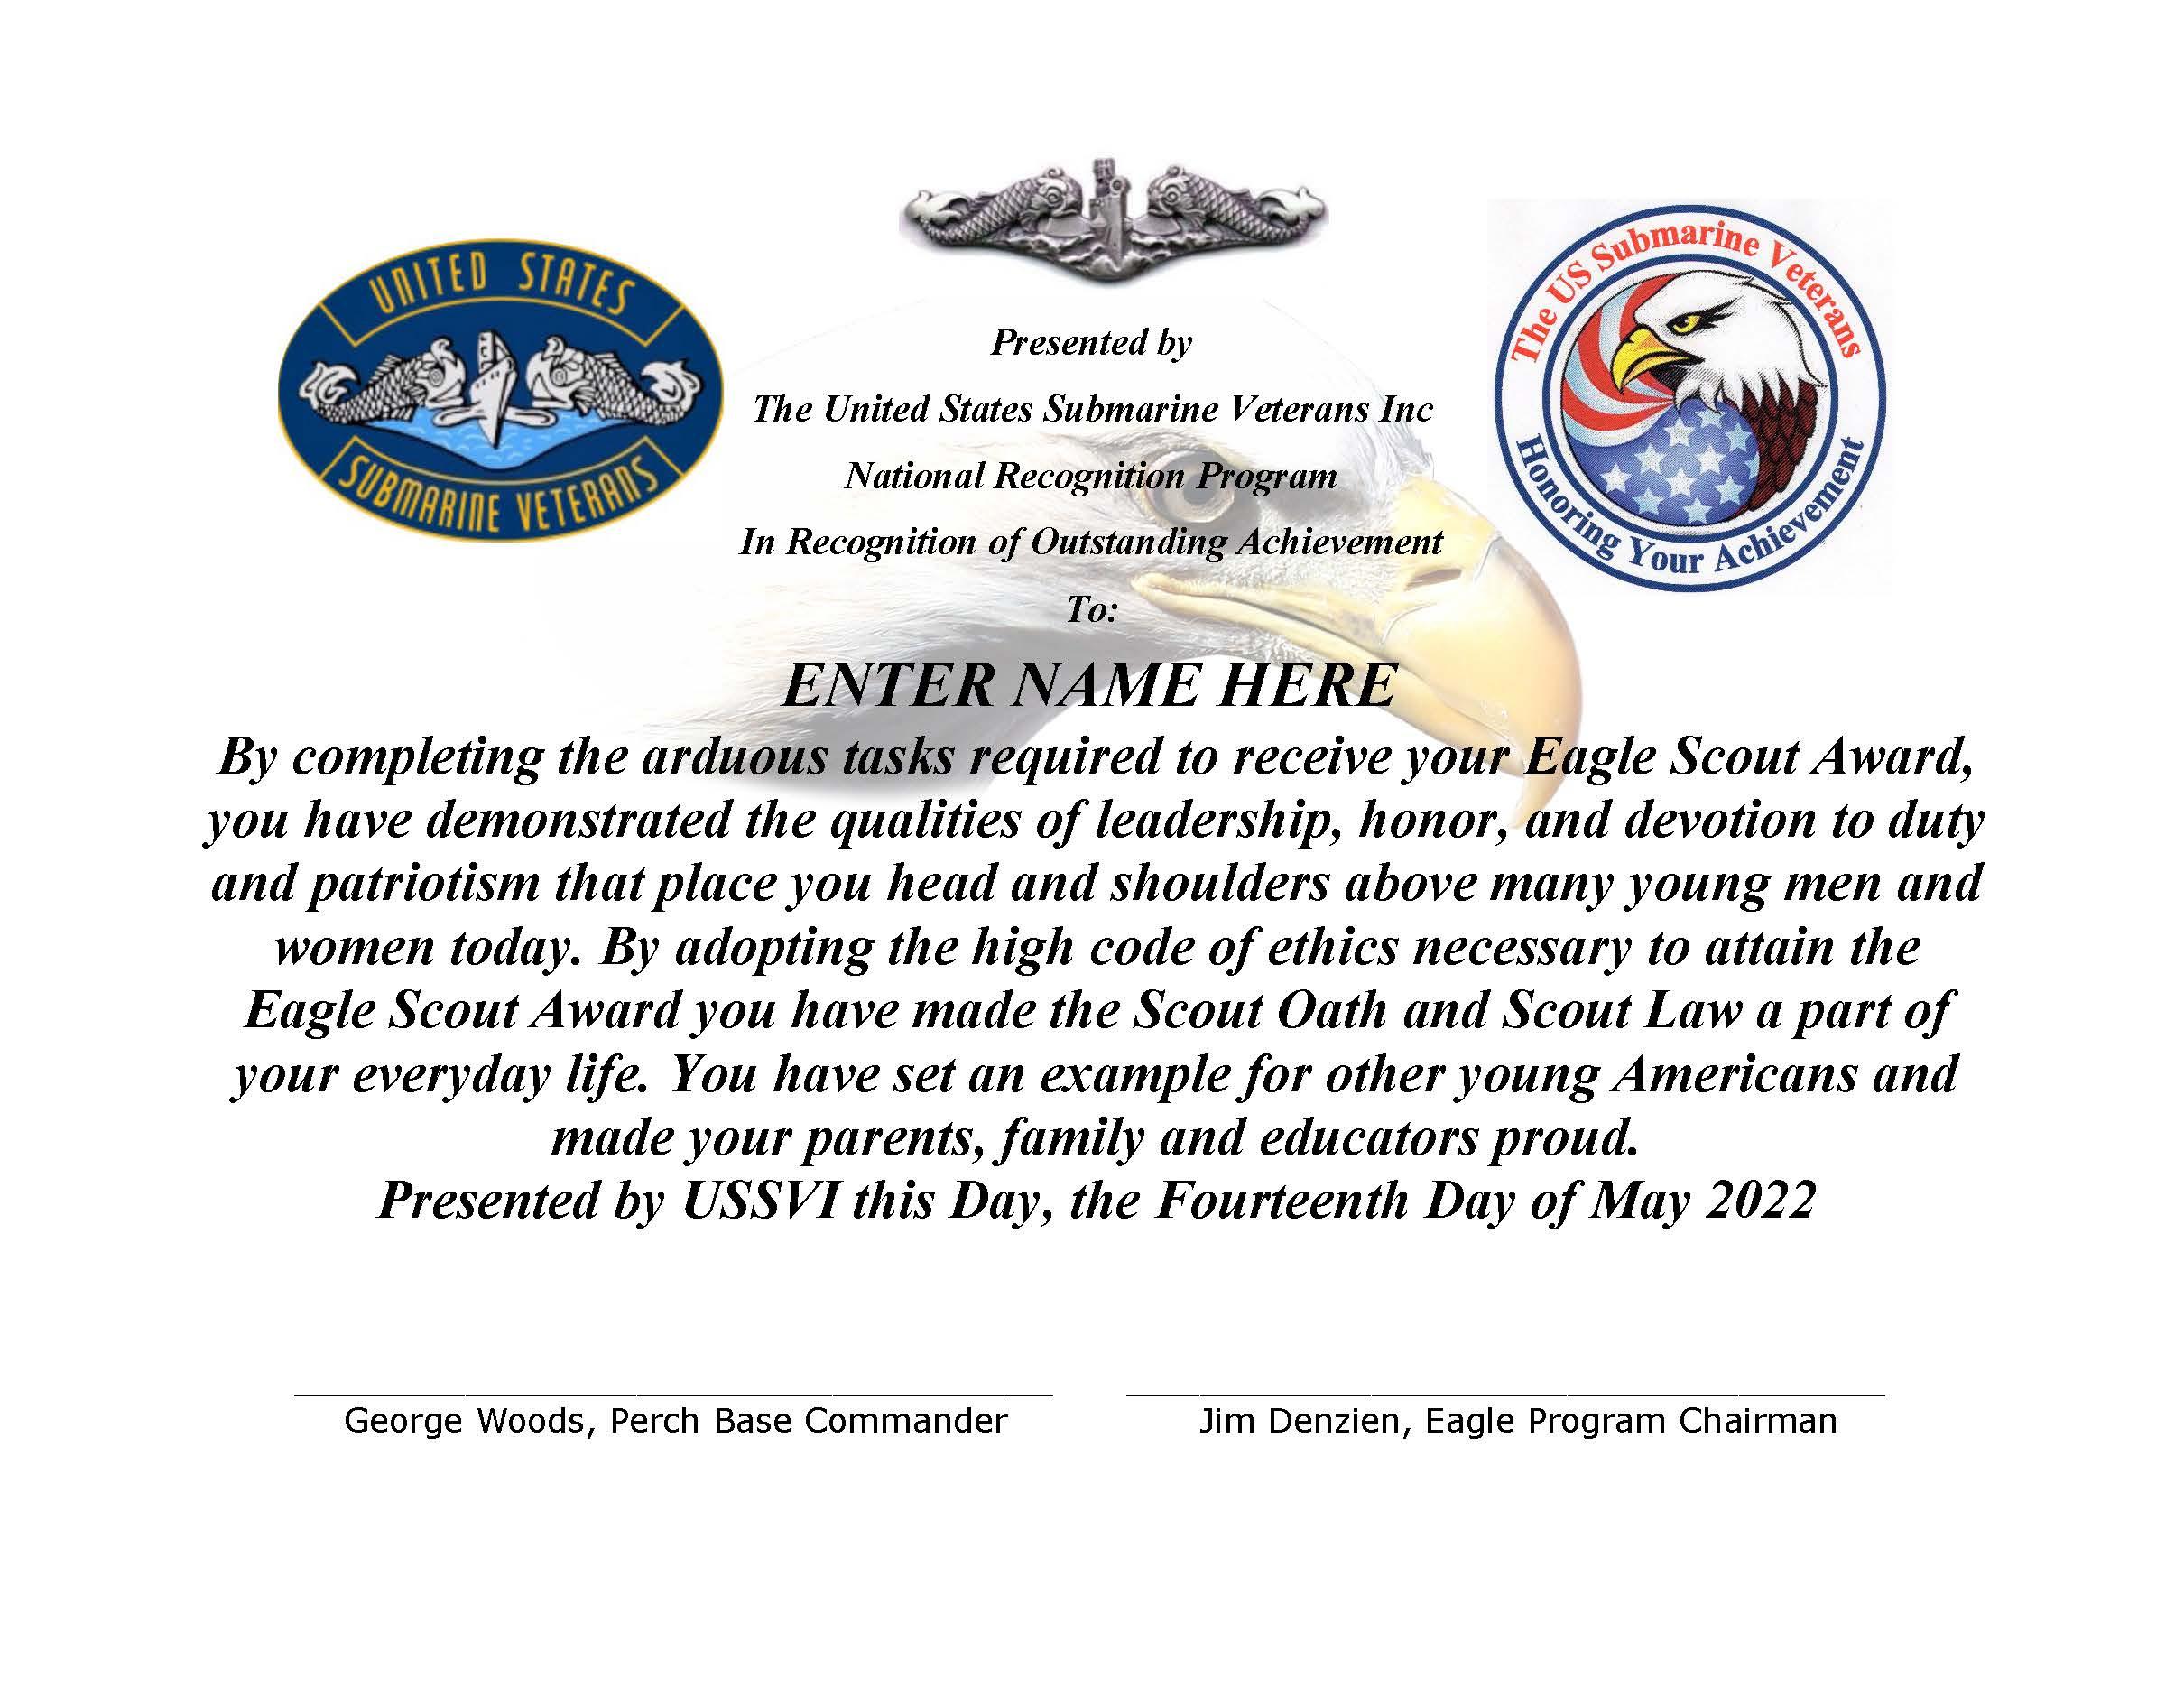 perch base ussvi eagle scout program